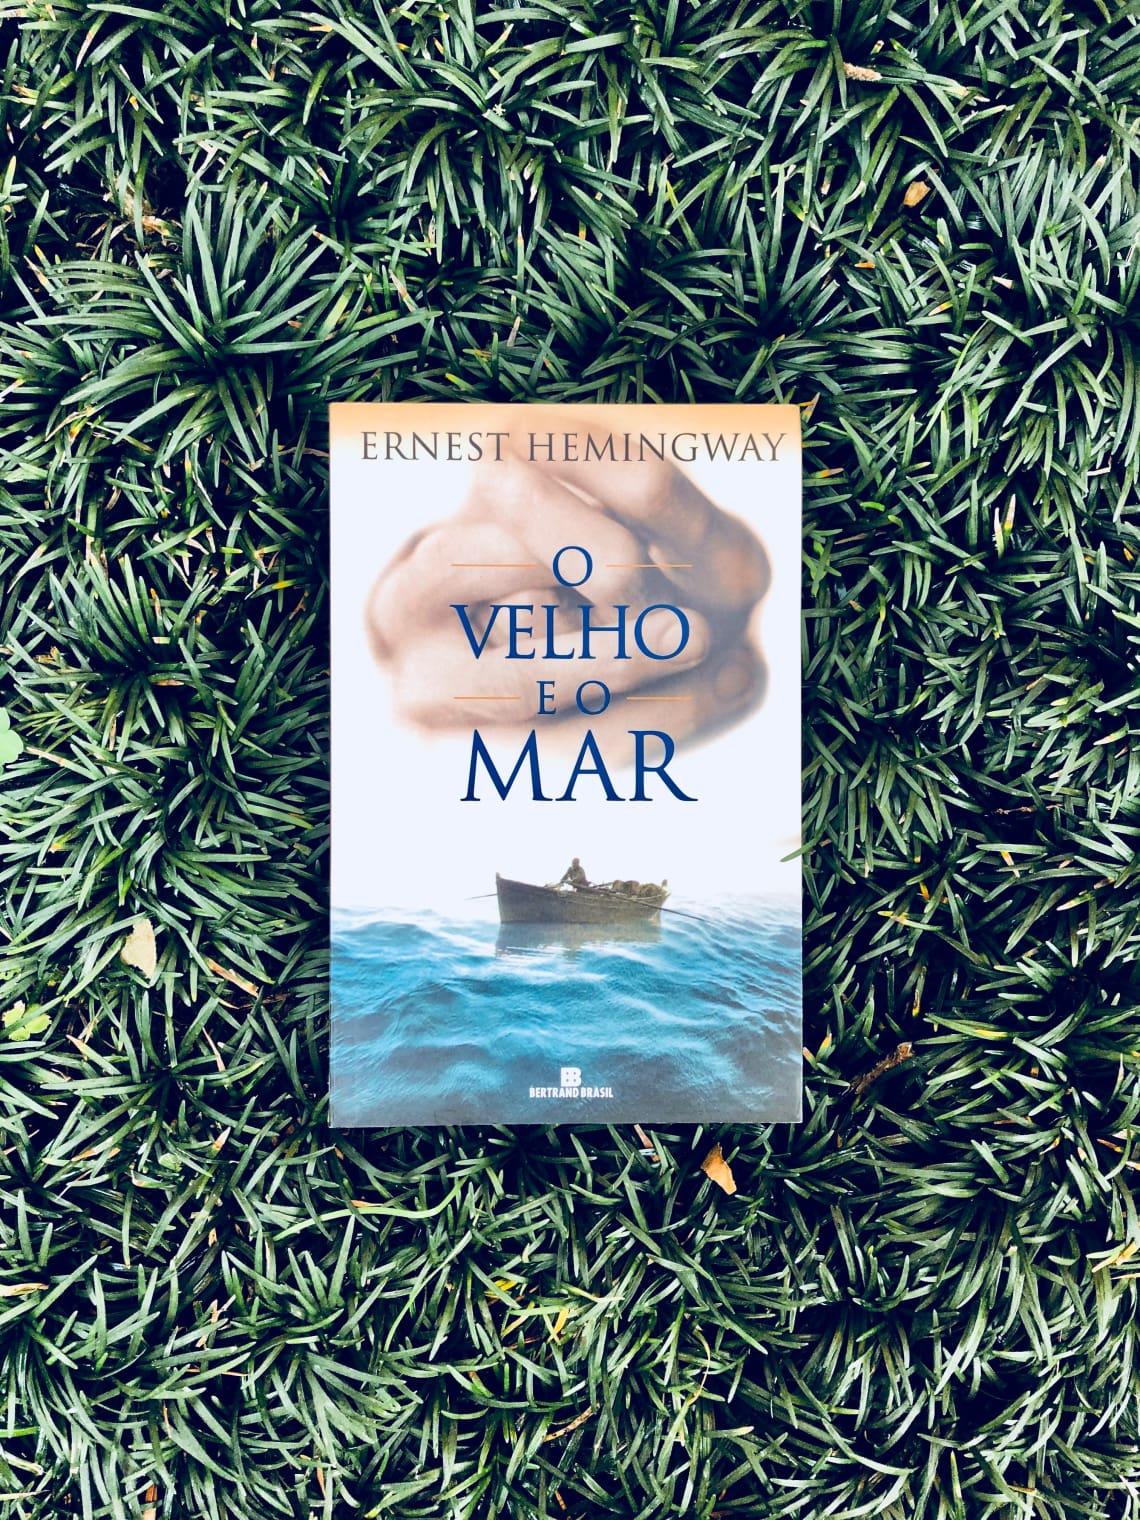 O velho e o mar, Hemingway